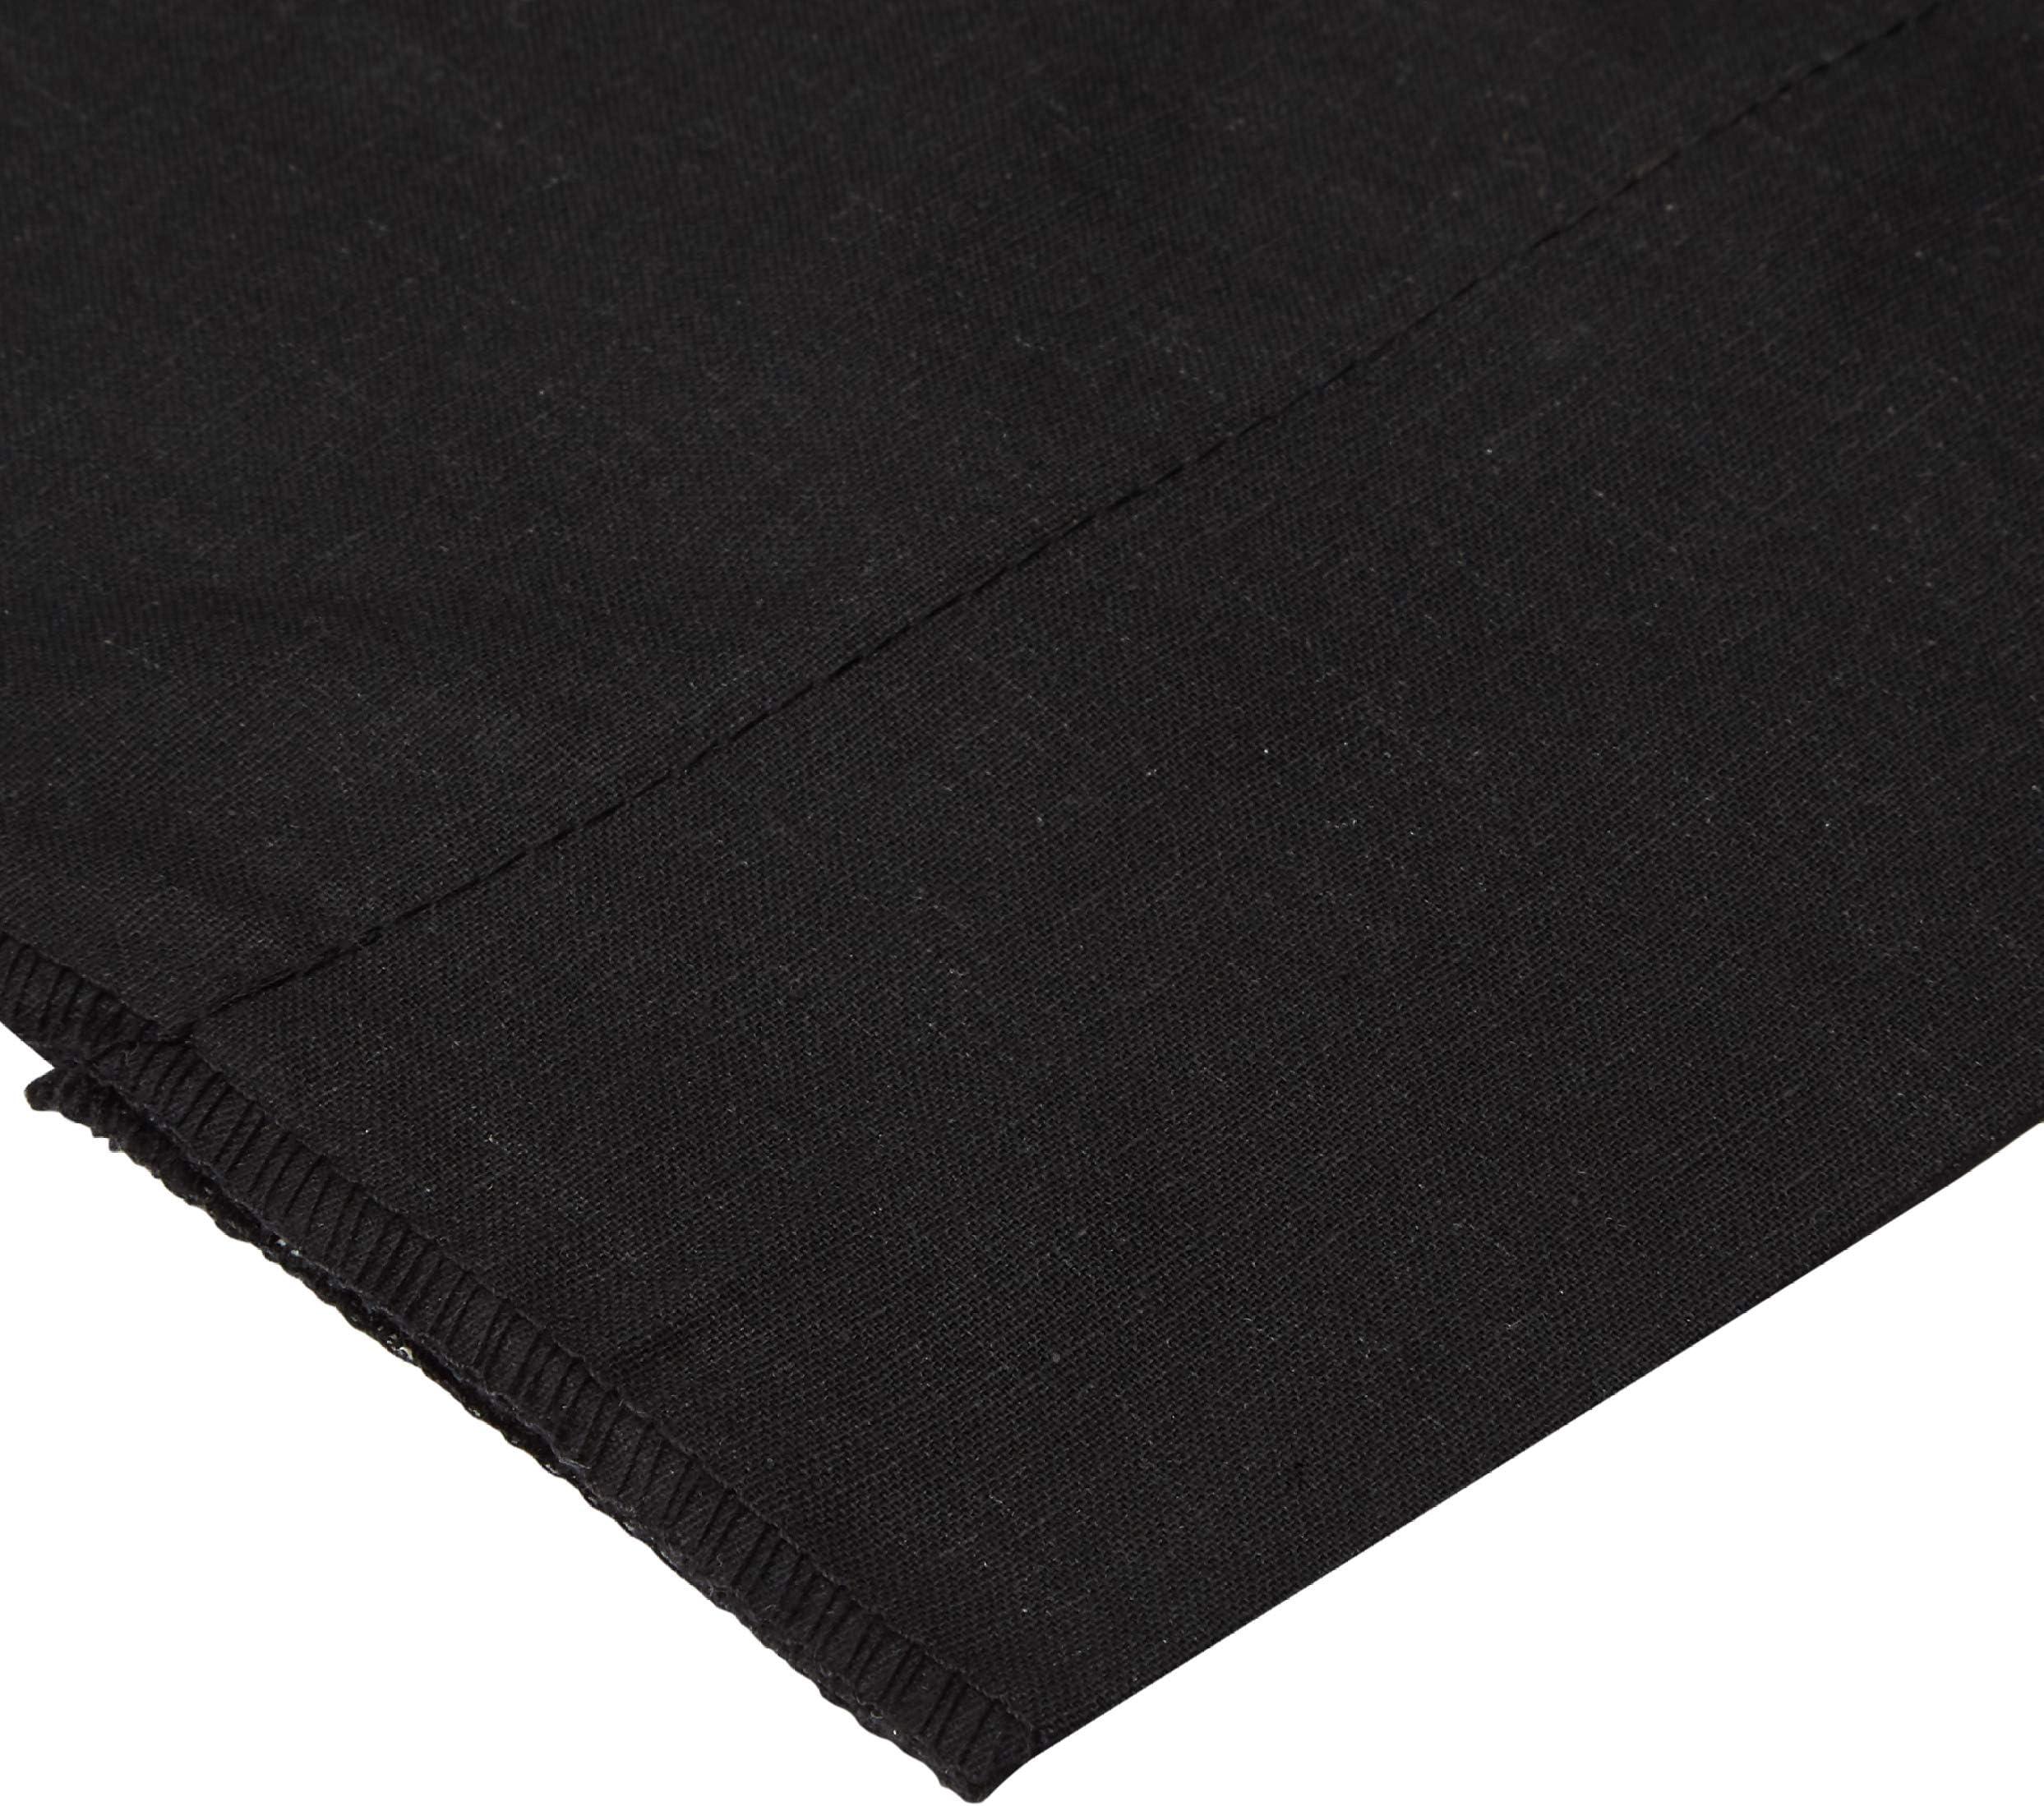 145cmx115cm piece Cotton Velvet Pure Black Fabric Plain Fabric Remnant Fabric Cut off Fabric Fashion Fabric Clothing Craft Supplies Fabric